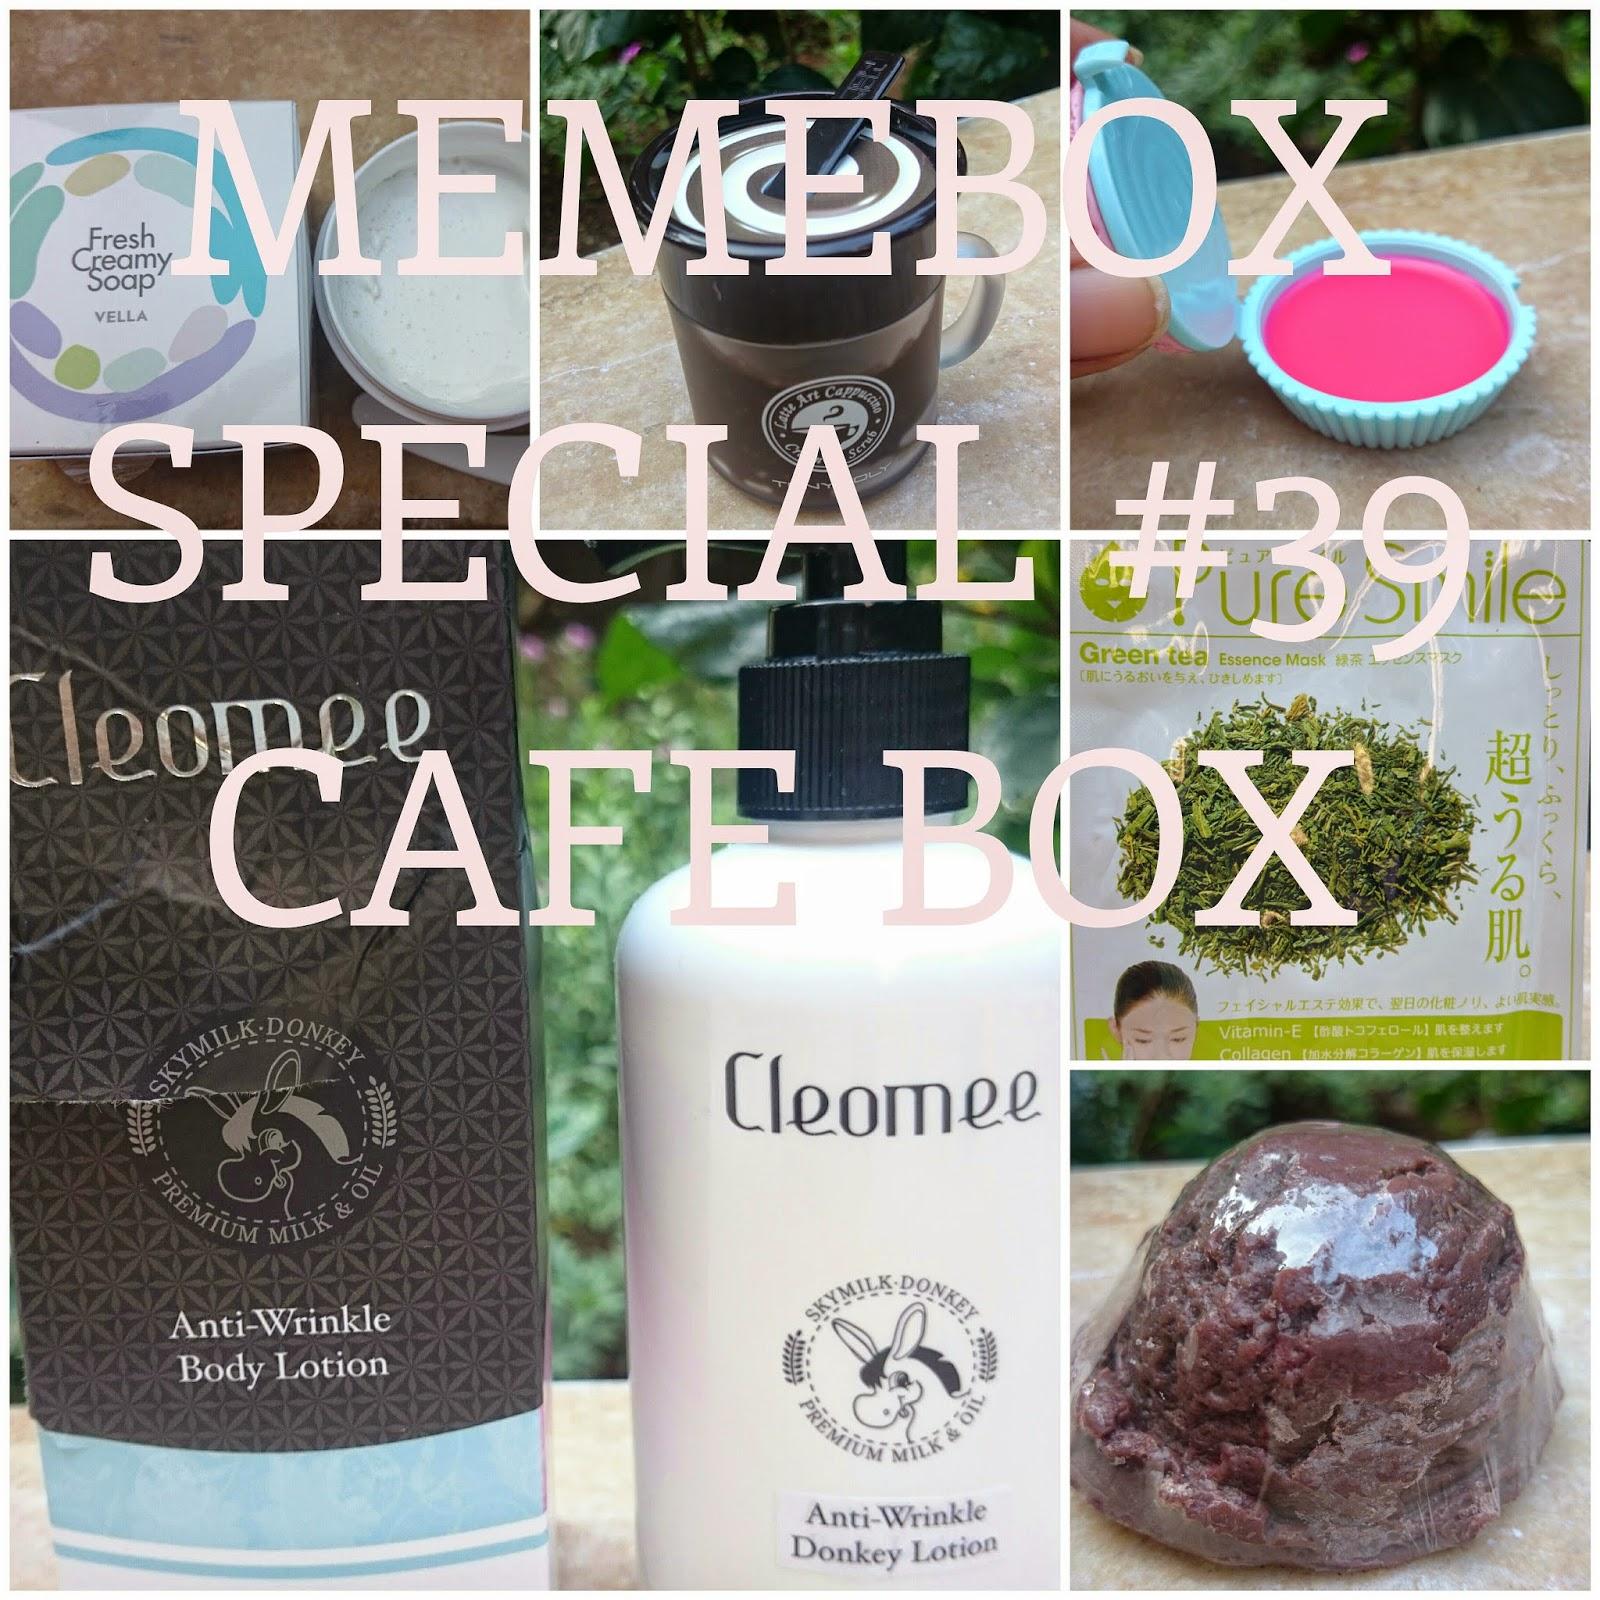 contents of Memebox Special #39 Café Box